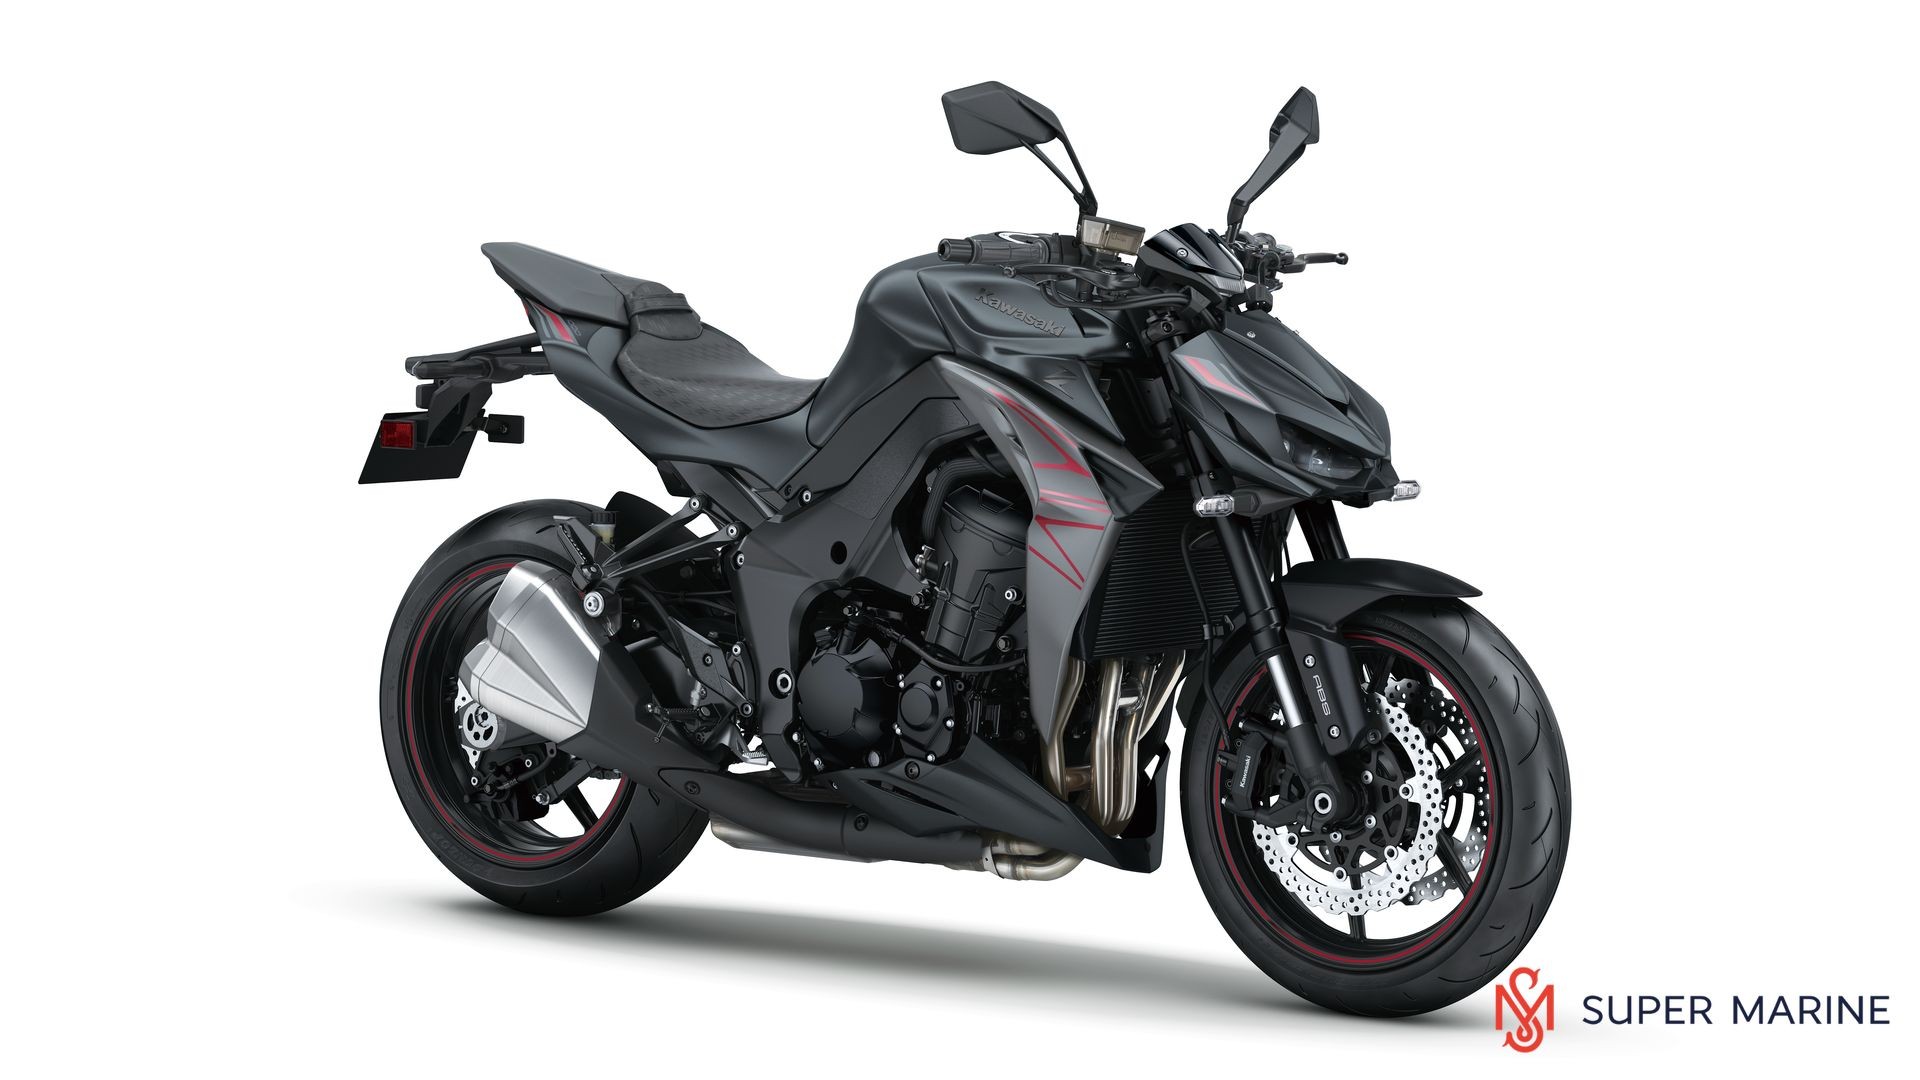 Мотоцикл Kawasaki Z1000 Черный 2020 - 1